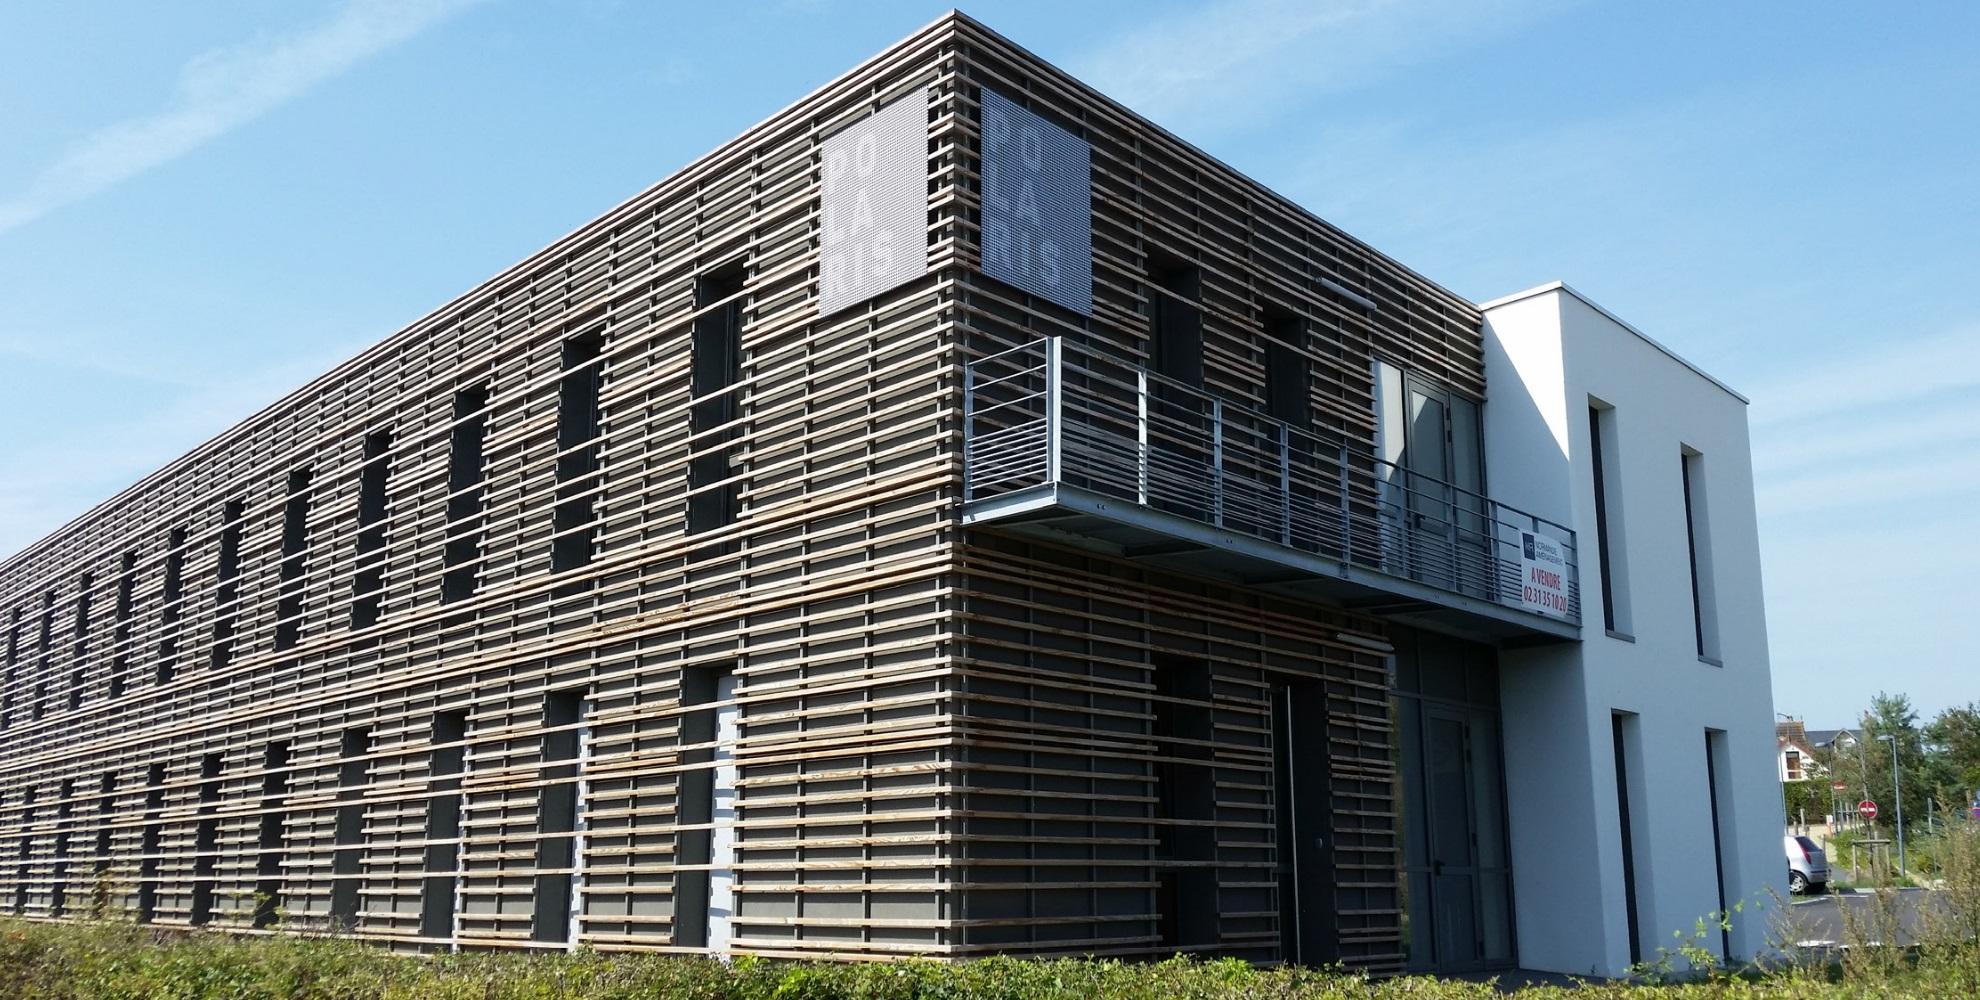 Normandie-amenagement-bureaux-avendre-Caen-Polaris1900